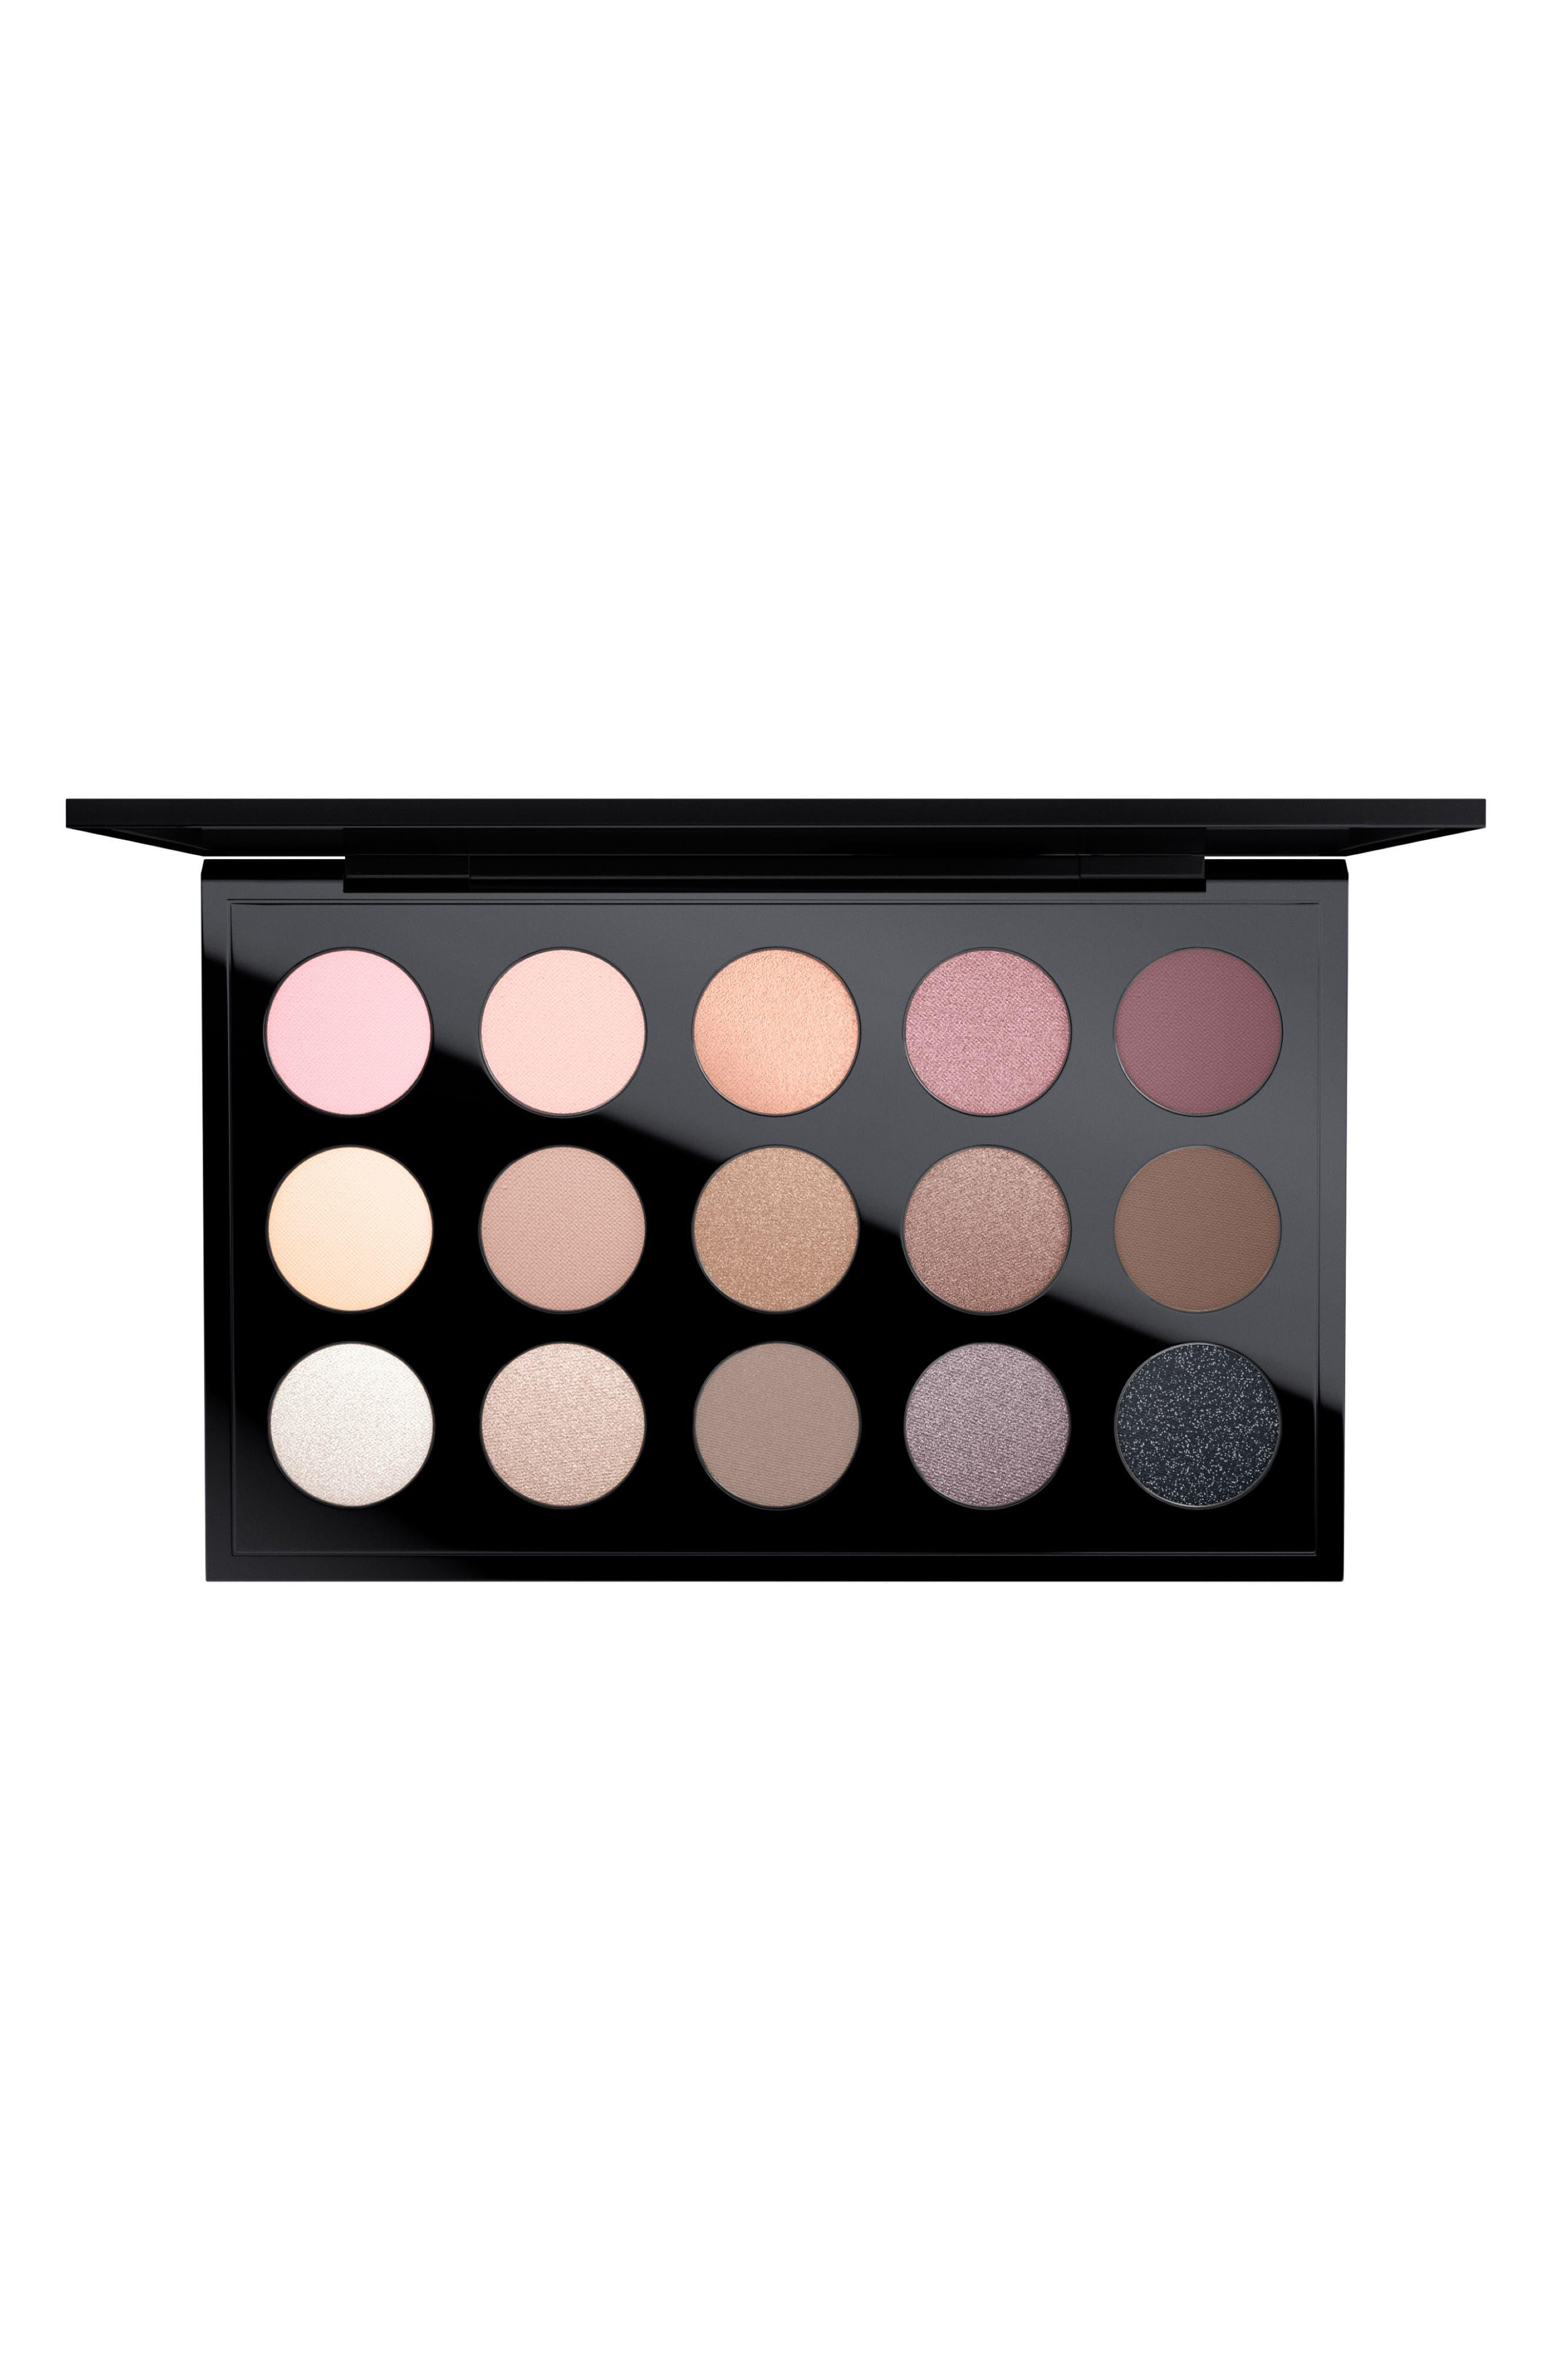 MAC Cool Neutral Times 15 Eyeshadow Palette,                         Main,                         color, COOL NEUTRAL